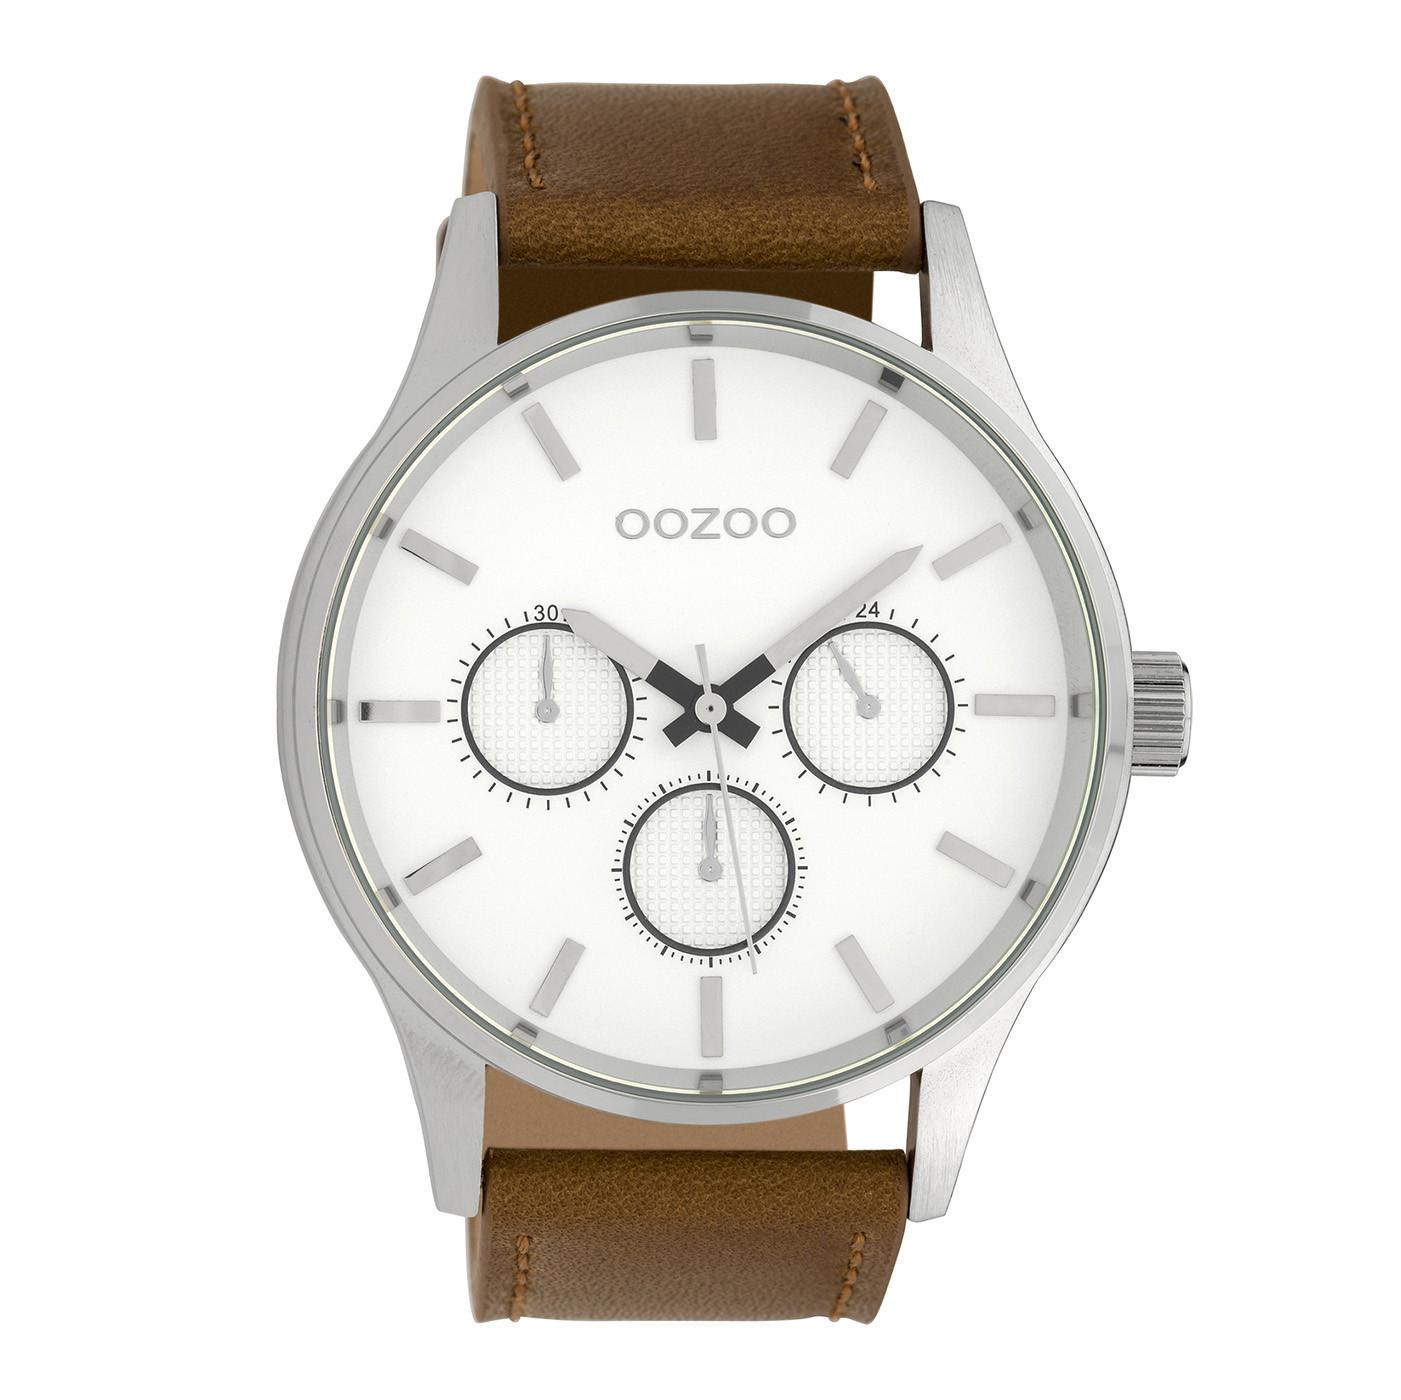 OOZOO Timepieces Bruin/Wit horloge C10045 (48 mm)